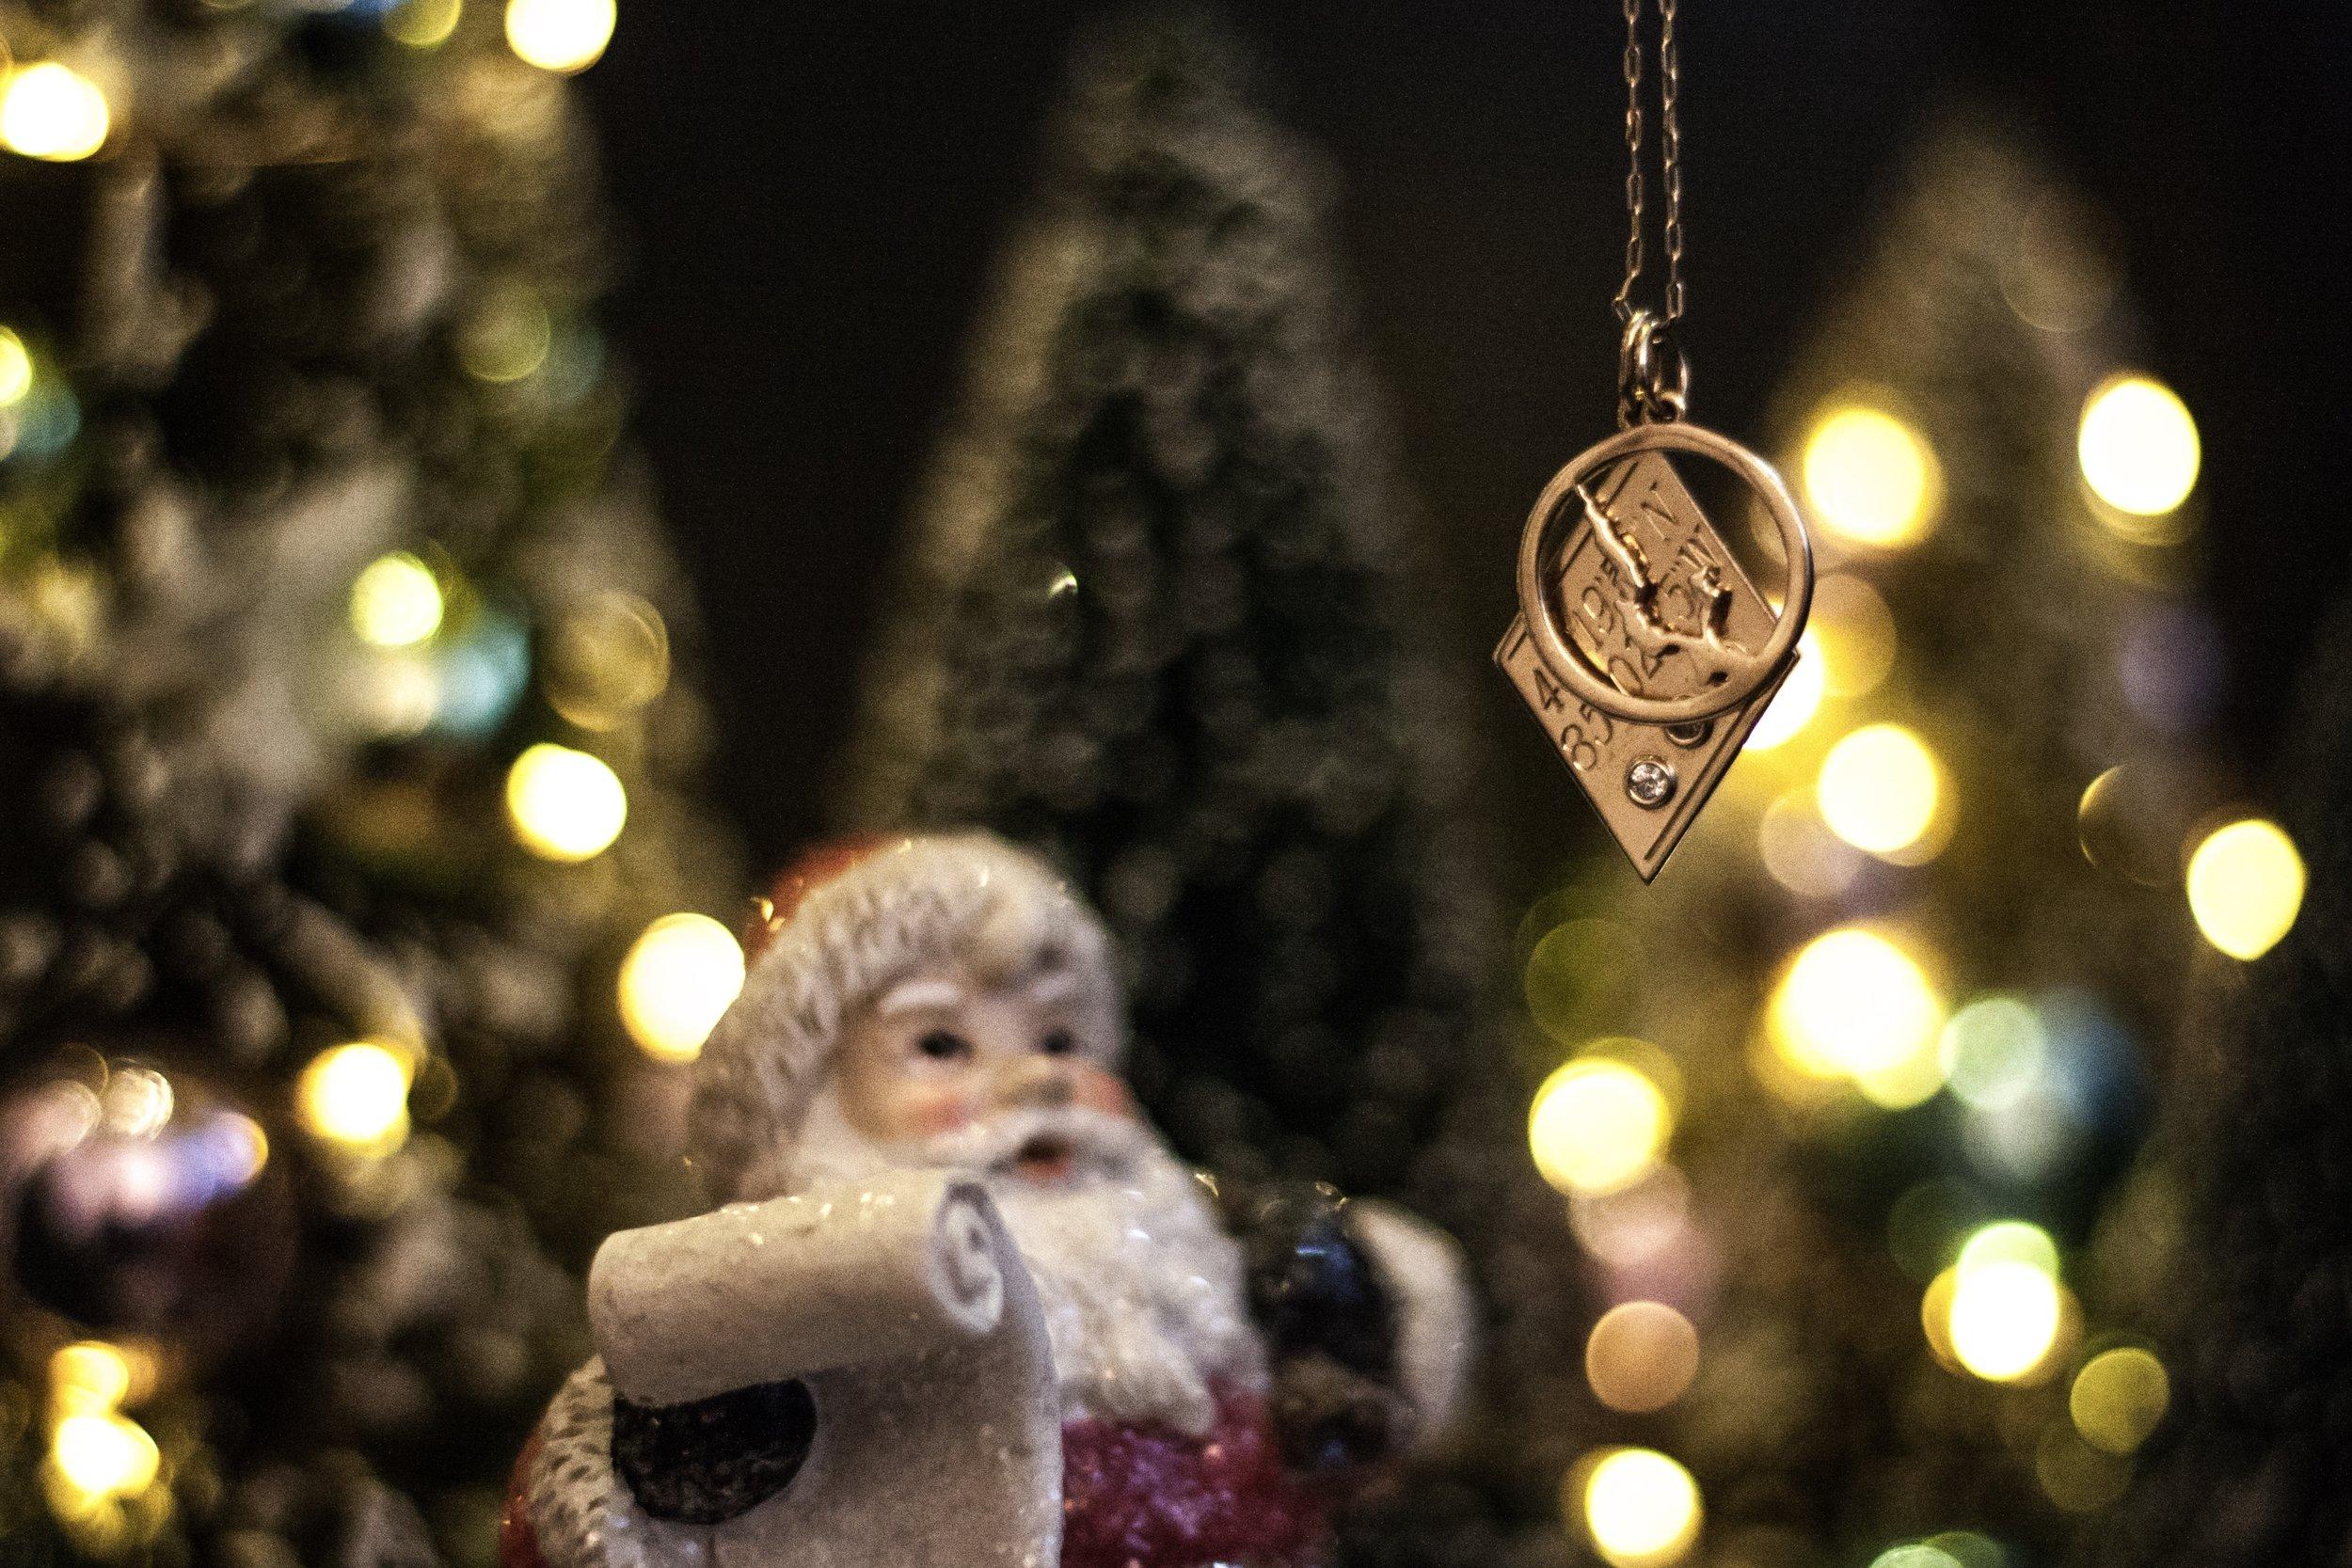 kerry gilligan jewelry 14k yellow gold walloon lake charm coordinates rings in 14k yellow gold with diamonds christmas gifts 2018 pendant diamond walloon necklace walloon charm coordinates pendant 2018.jpg